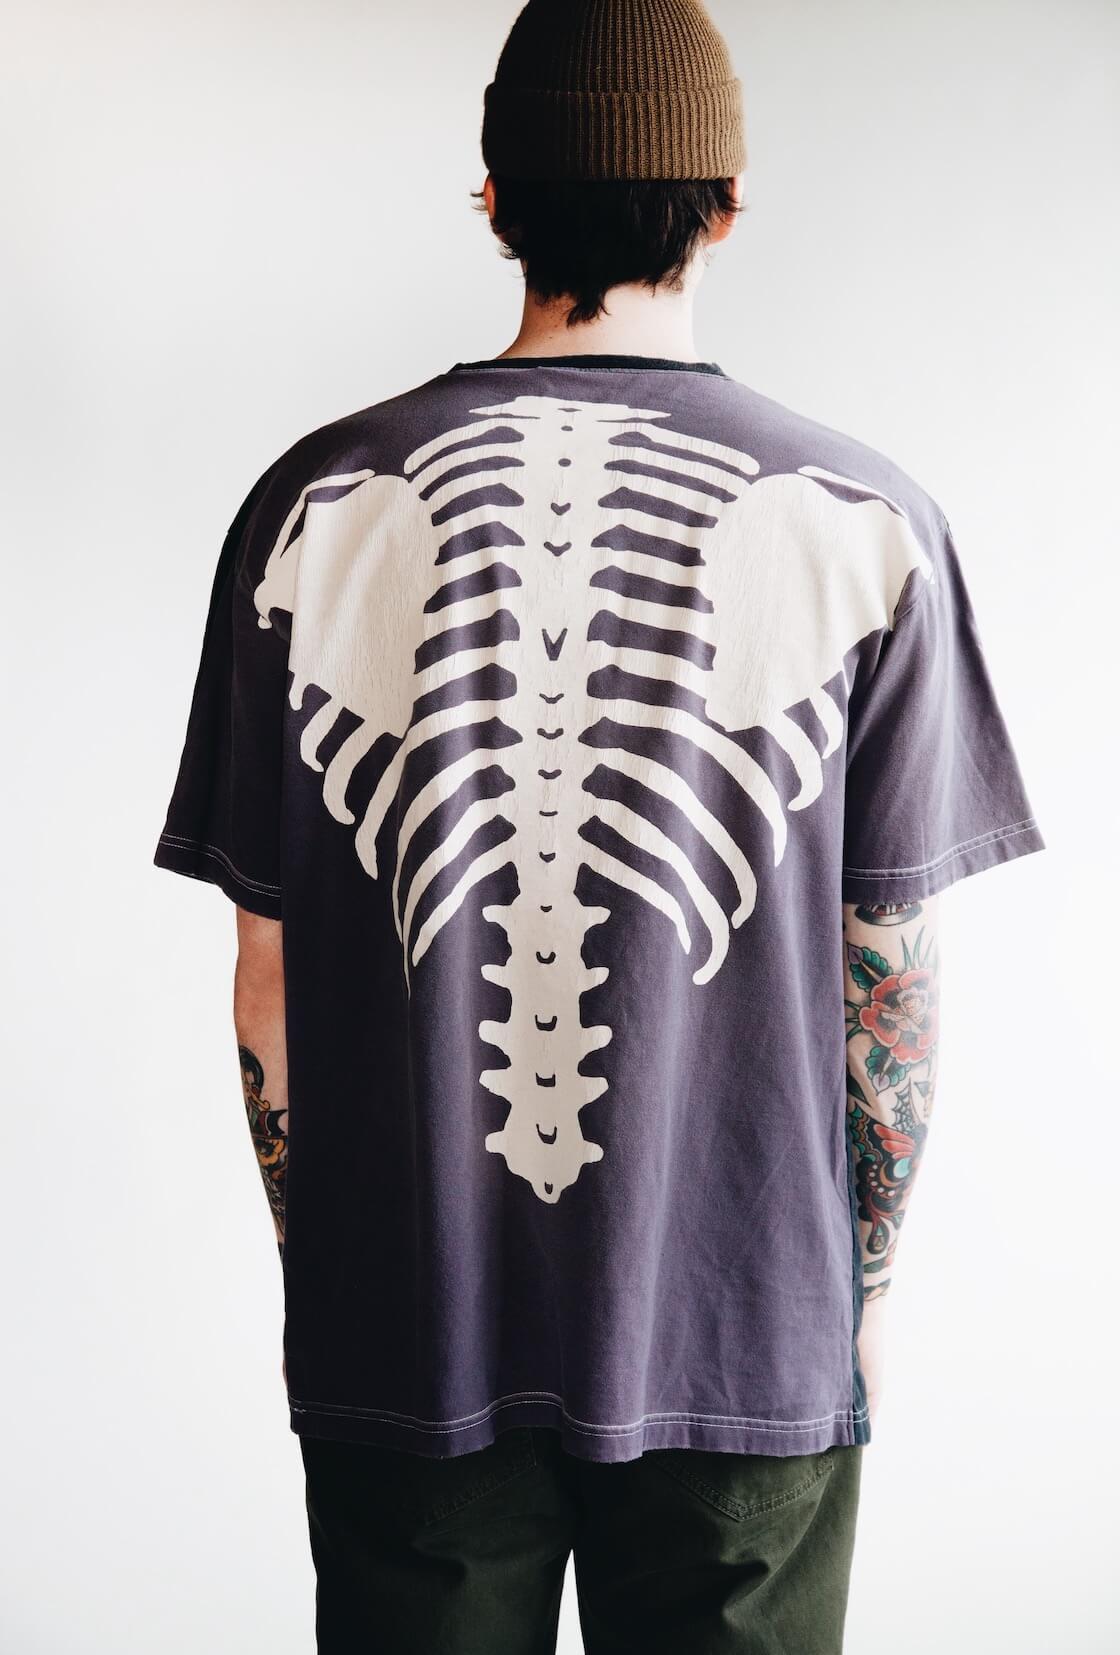 kapital kountry bones tee in purple and white on body